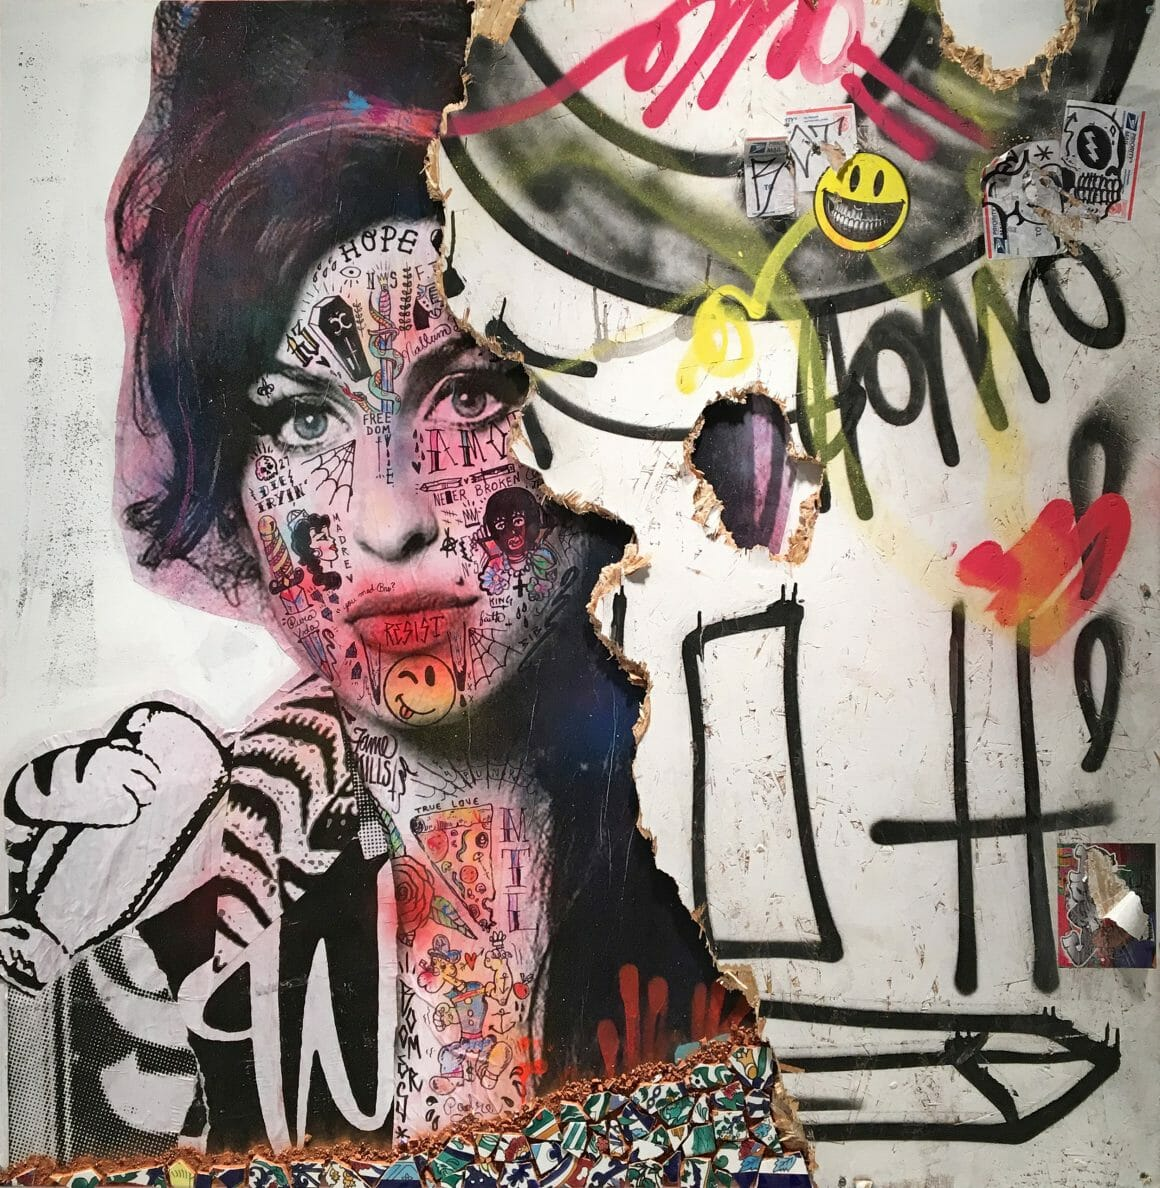 Stikki Peaches Amy Winehouse